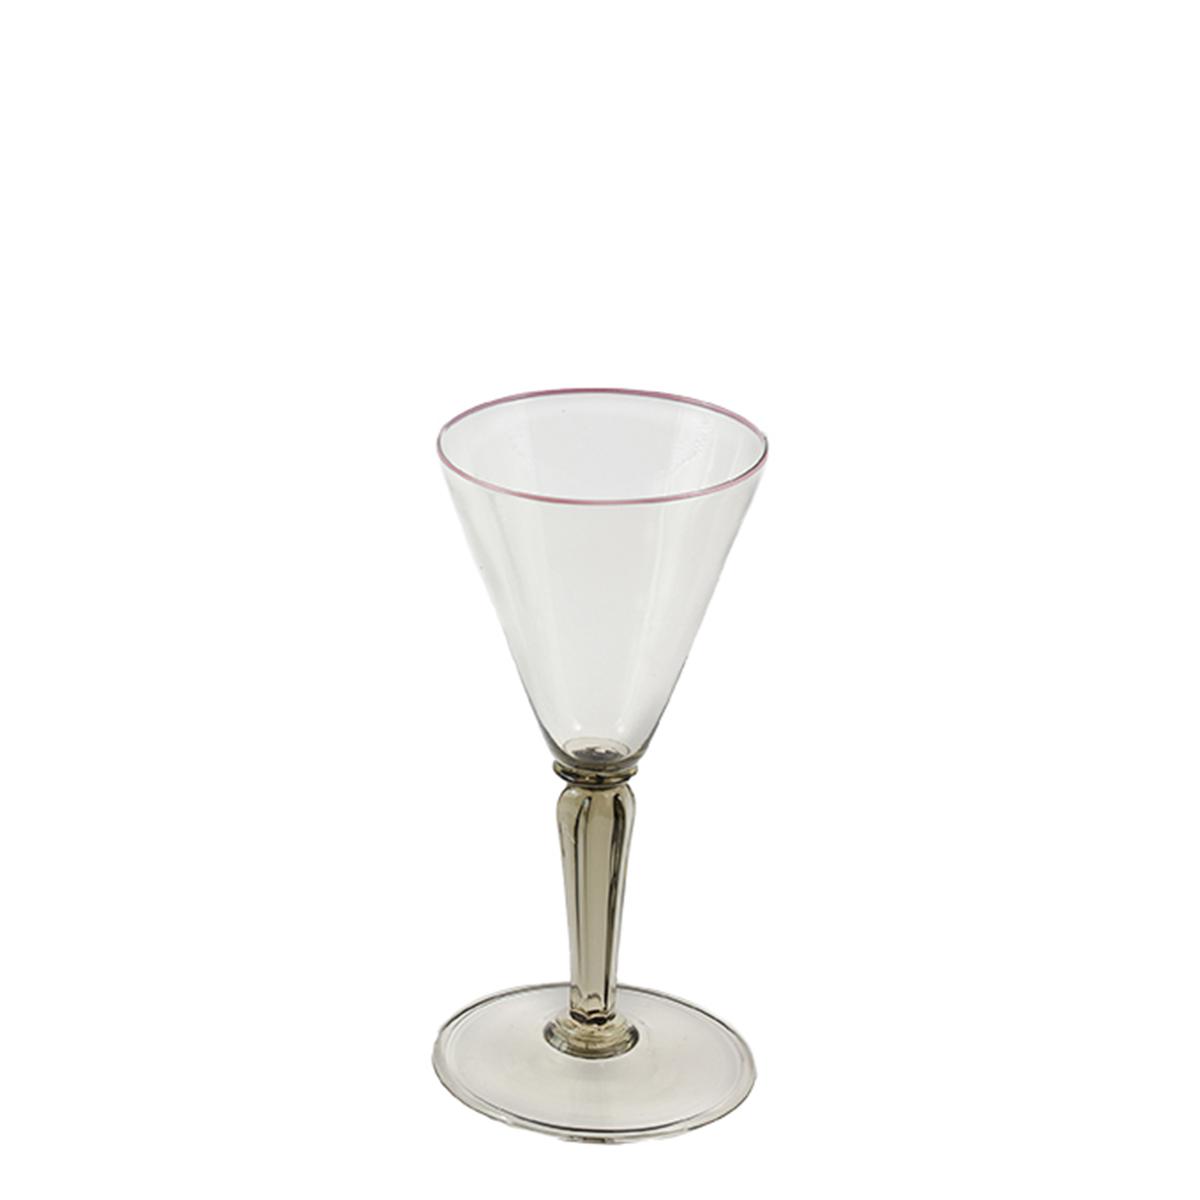 tulipano_glass_design_murano_handmade_venice_giberto_cocktail_wine_pink_rim